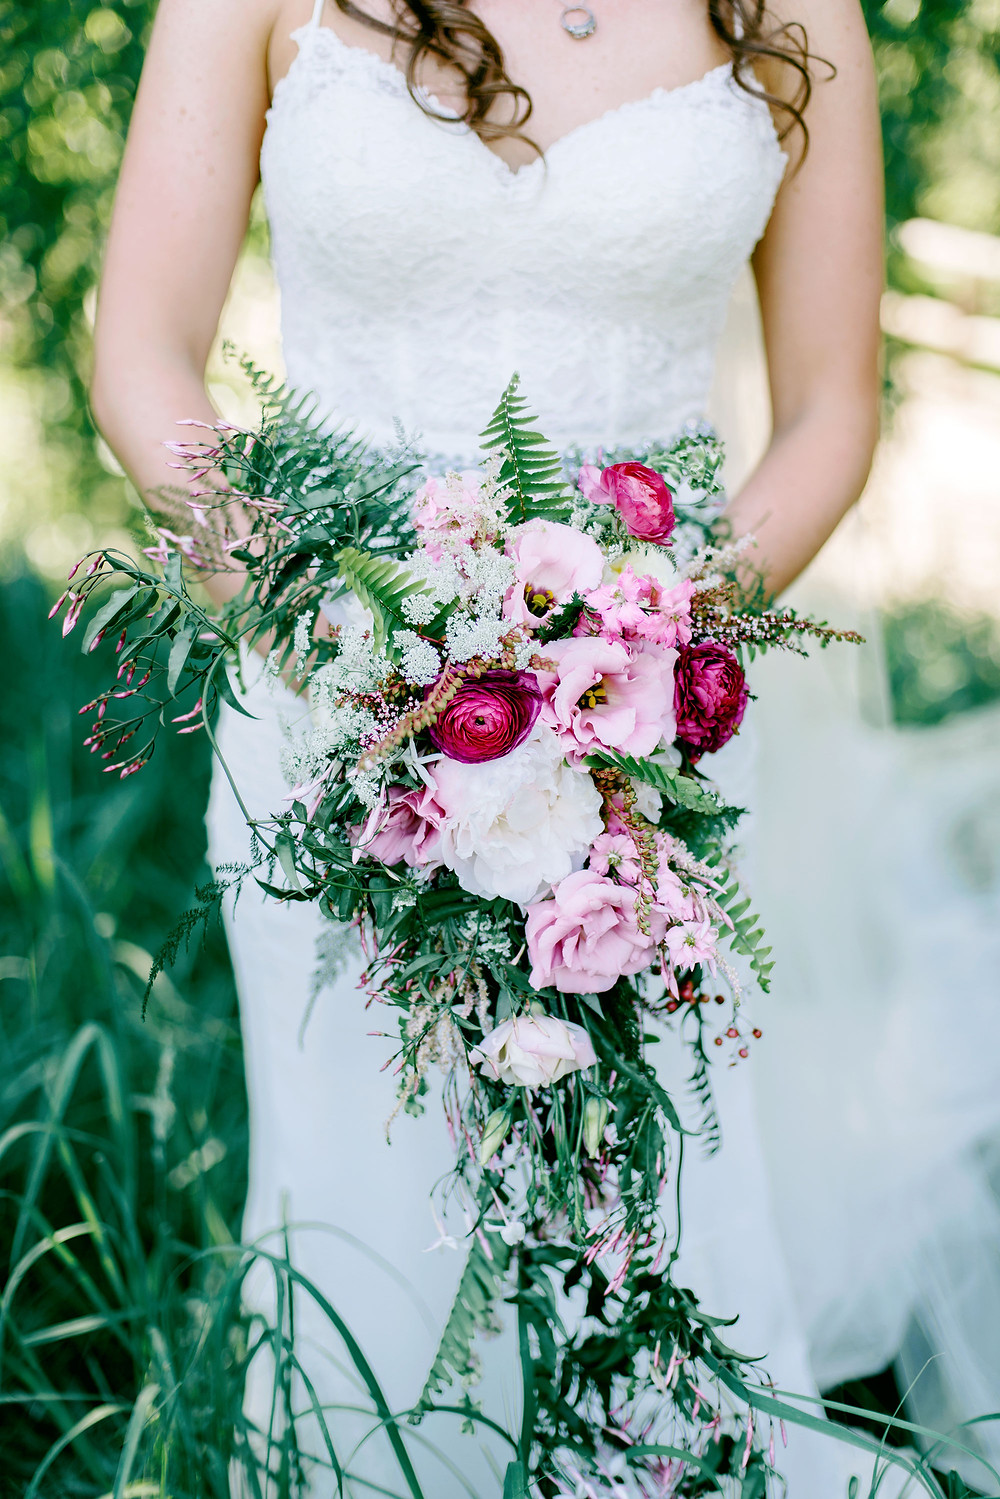 Denver Florist for your wedding at the Denver Botanic Gardens